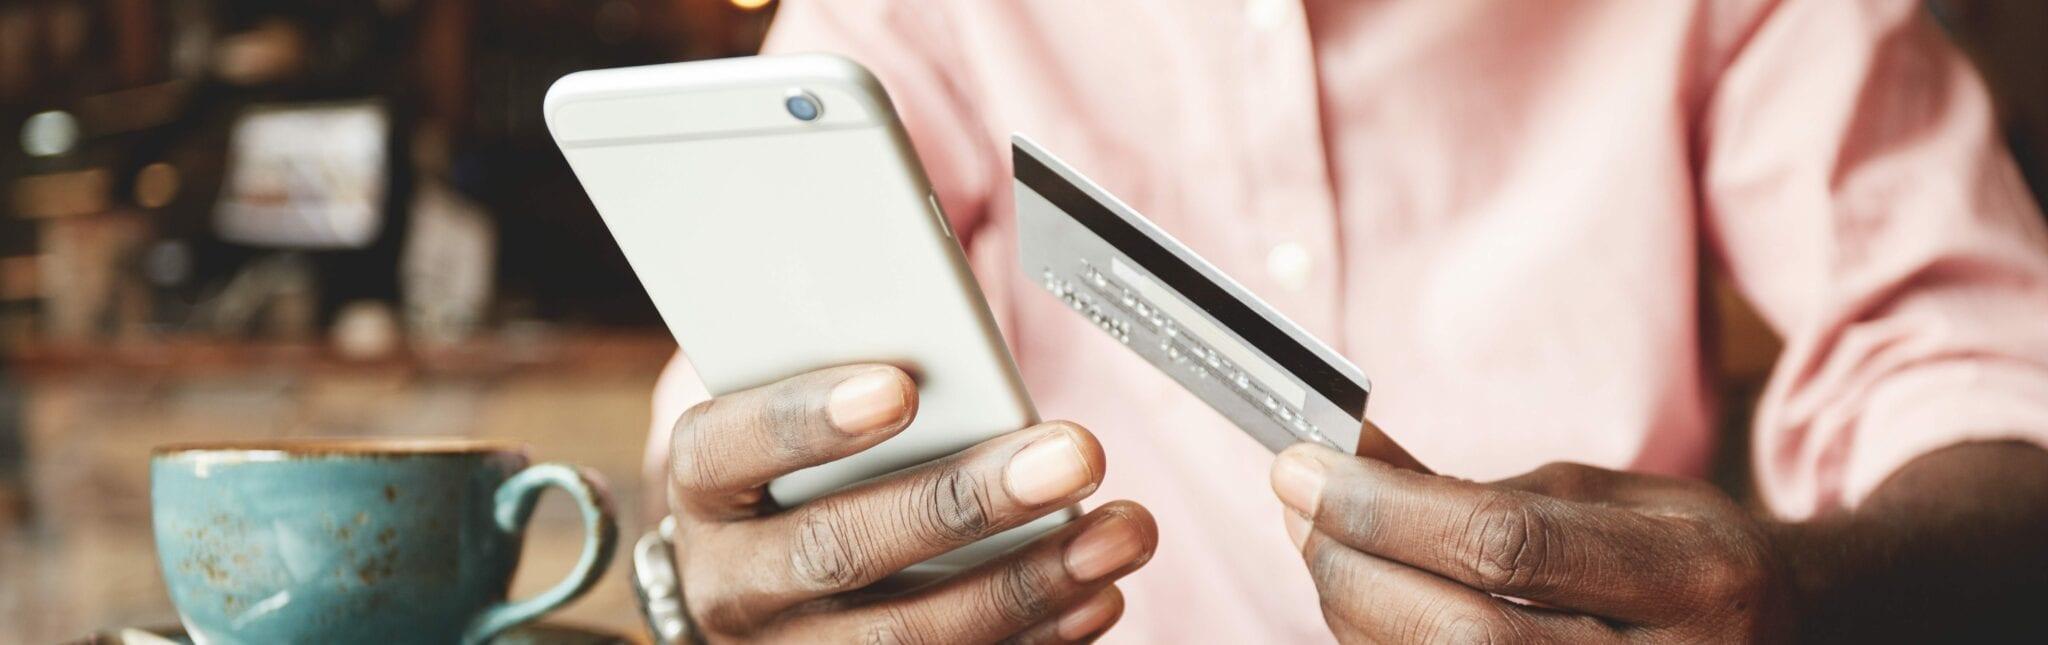 Atm Card Visa Debit Card Trumark Financial Credit Union